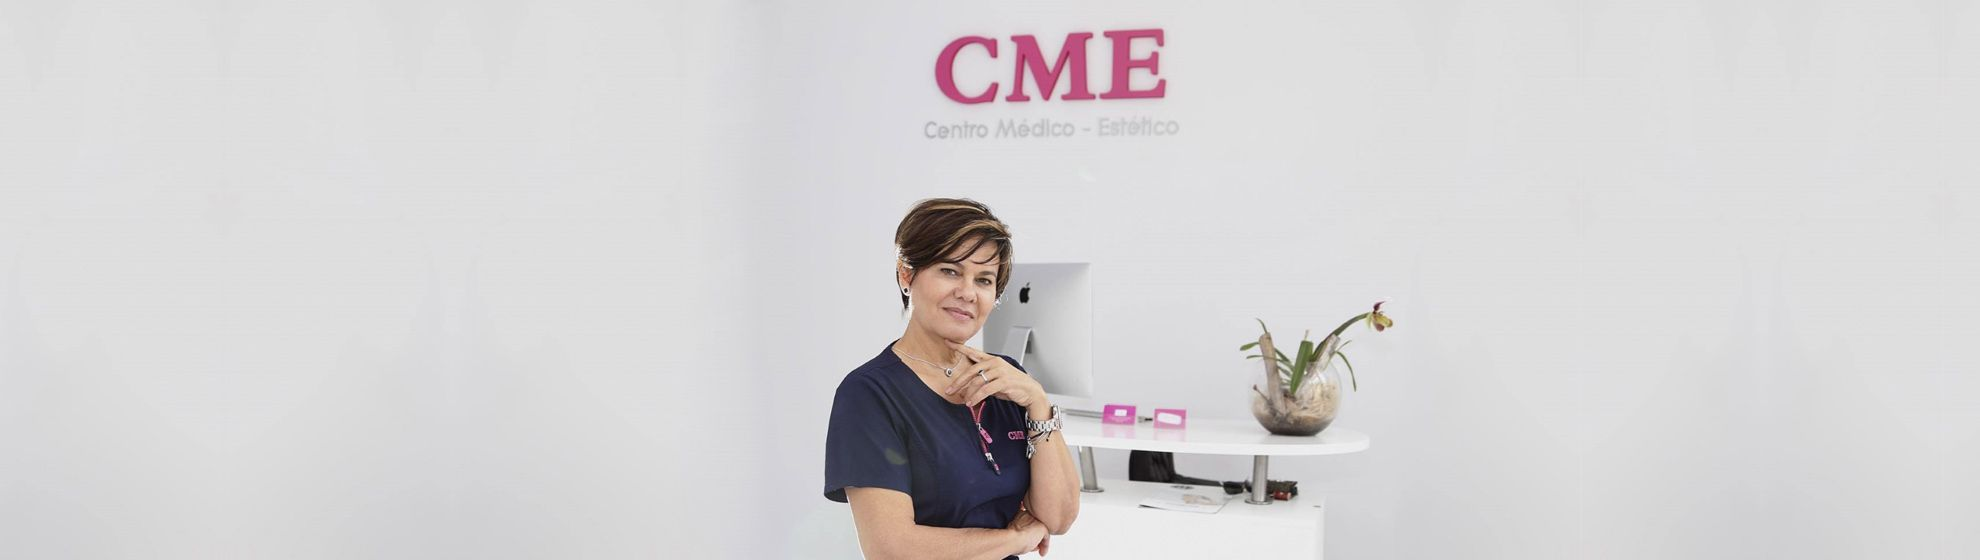 Dra. Alejandra Almenares